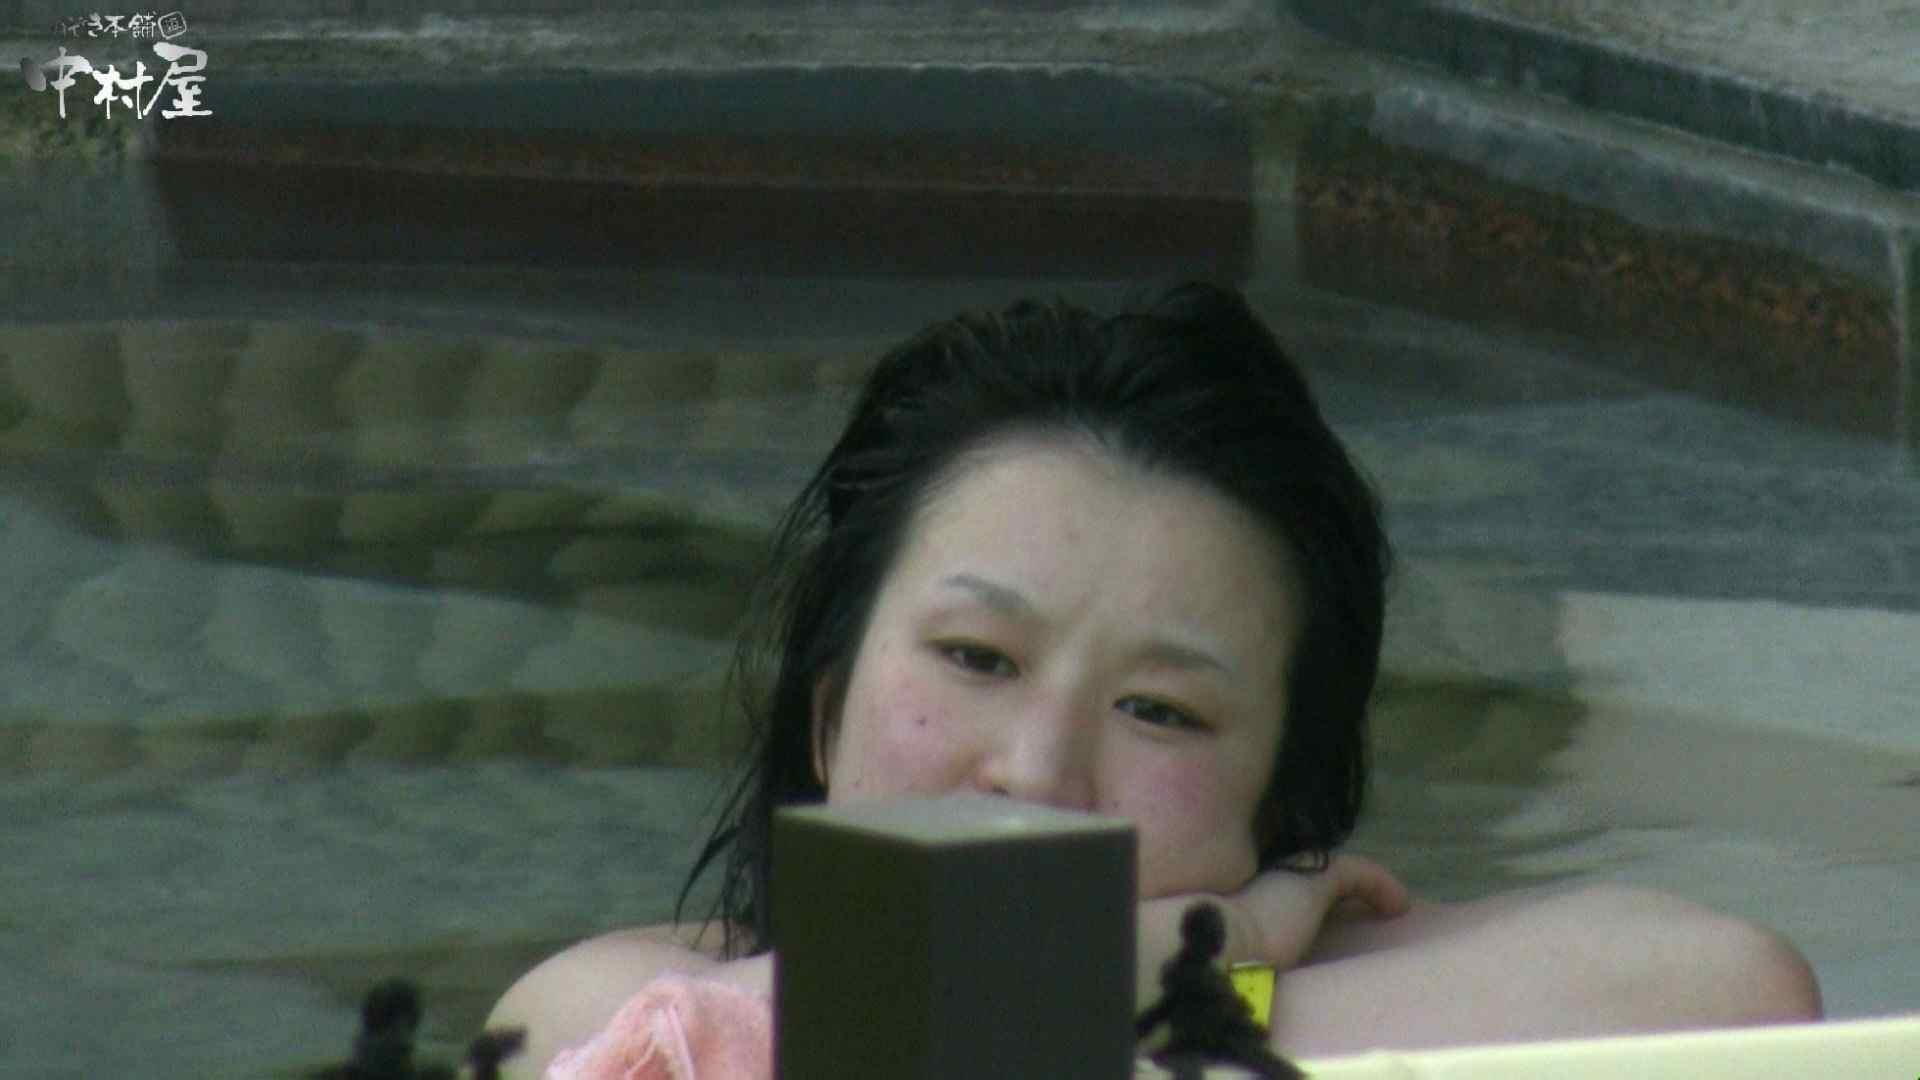 Aquaな露天風呂Vol.982 盗撮特撮  13pic 9